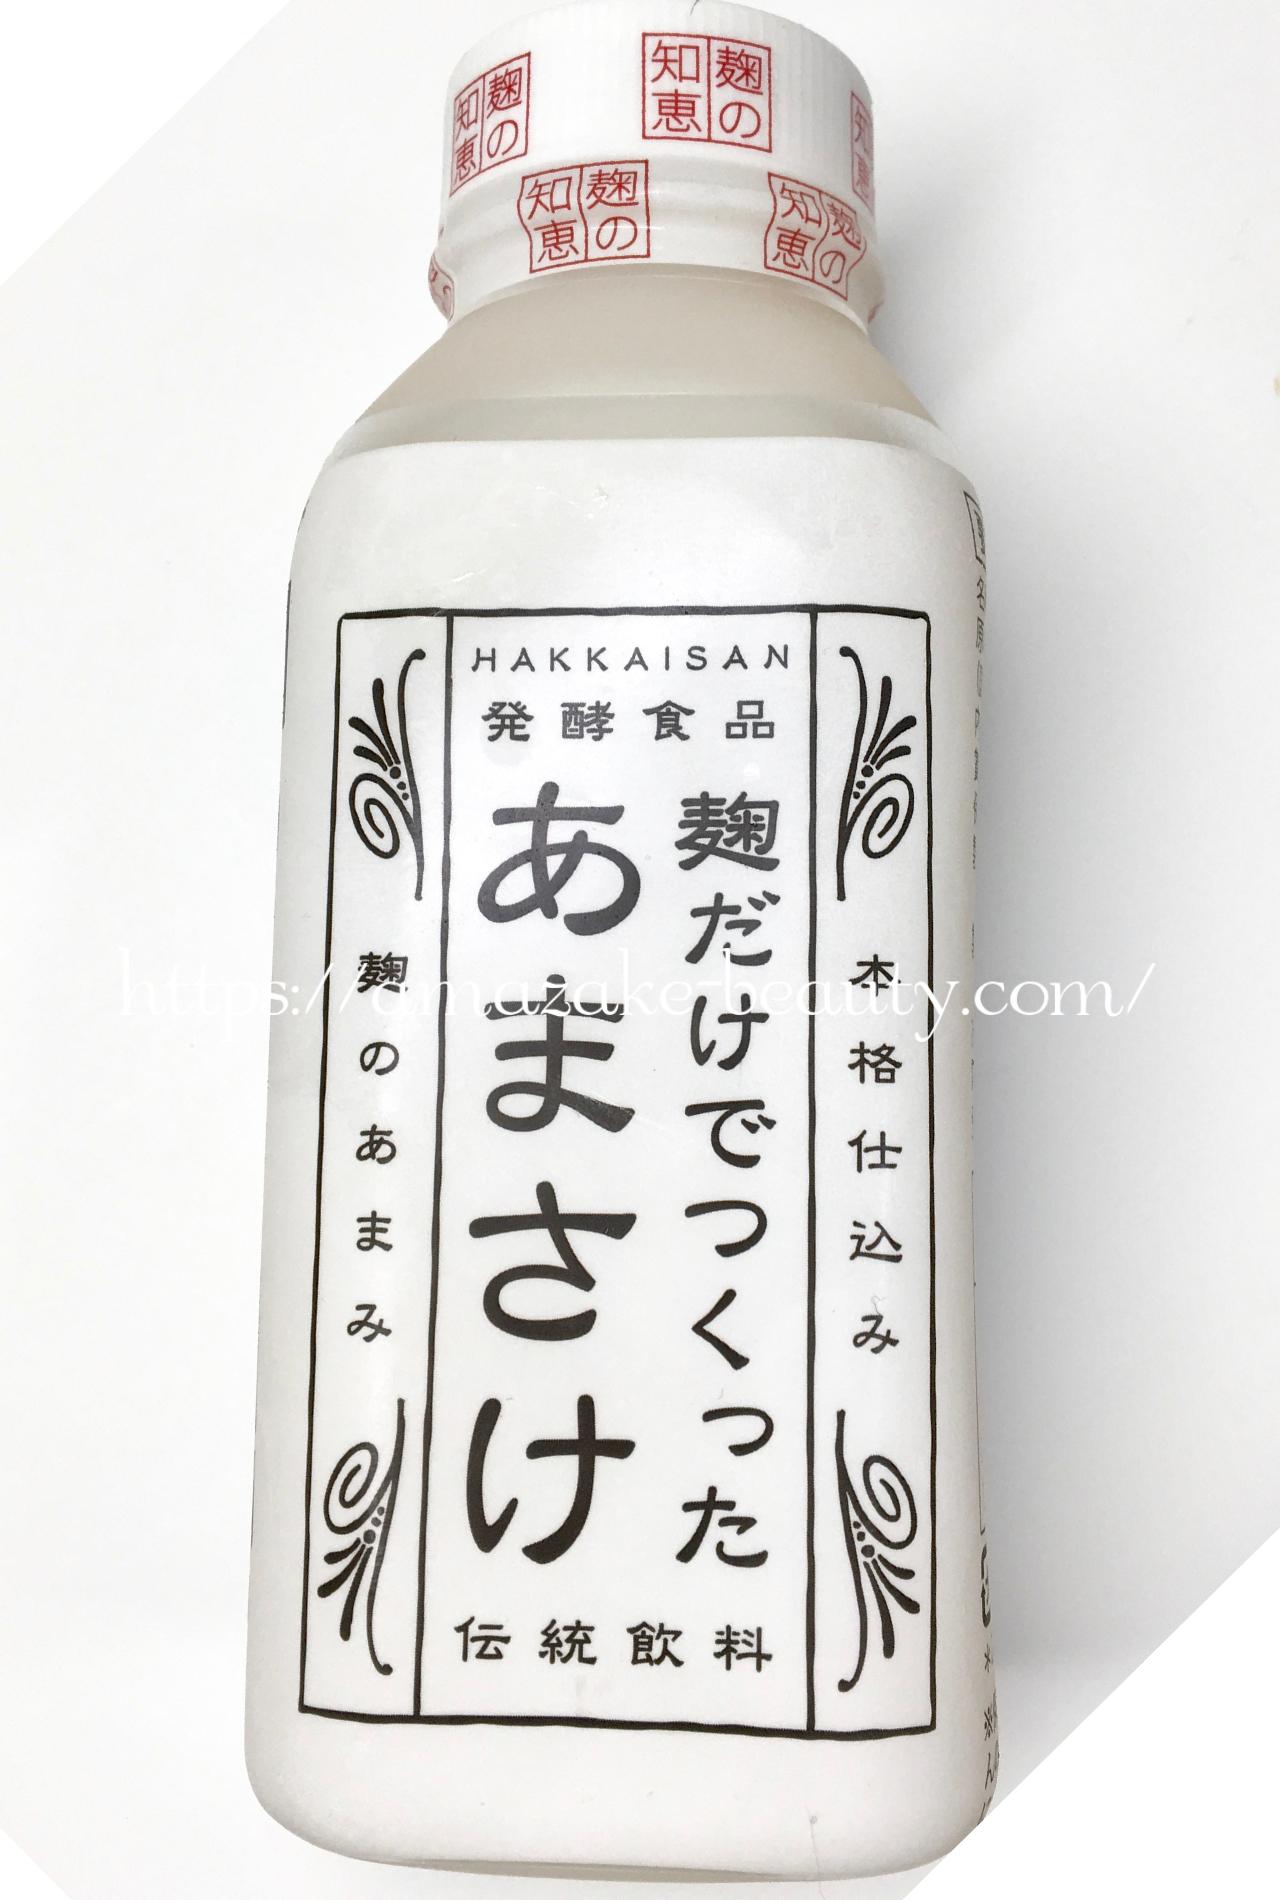 [amazake]hakkaisan[koji dakede tsukutta amasake](design)